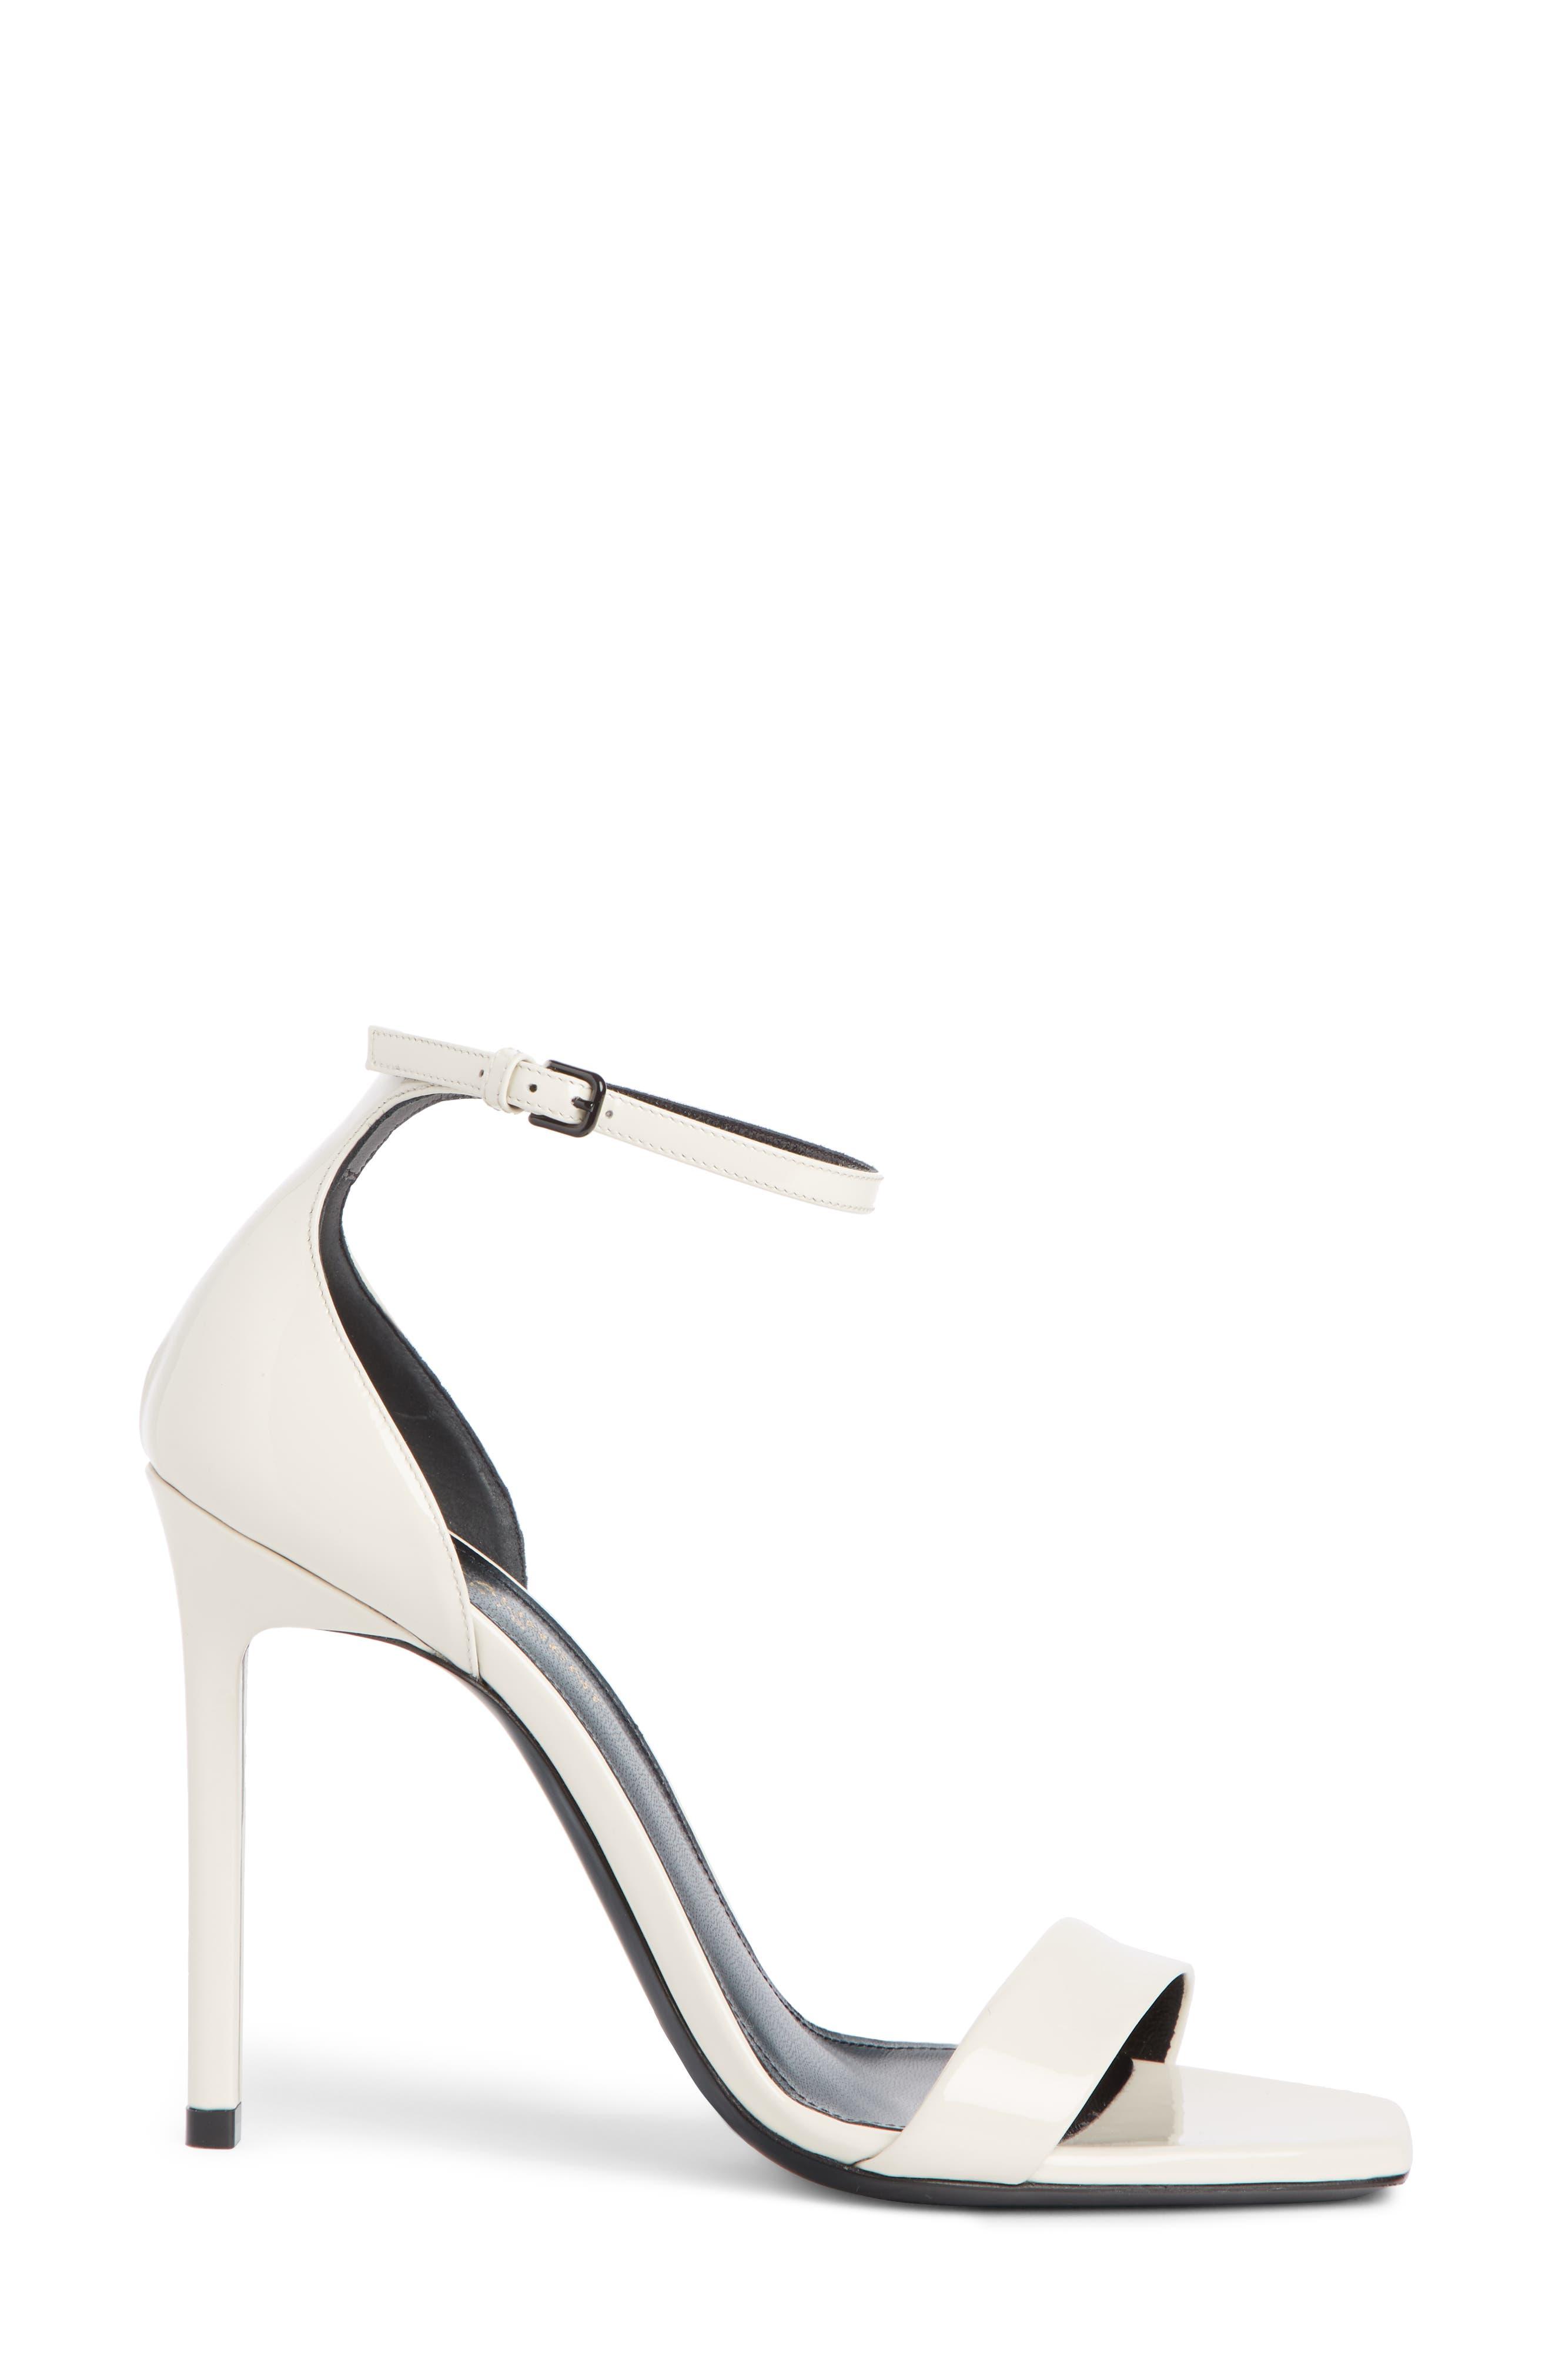 Amber Ankle Strap Sandal,                             Alternate thumbnail 3, color,                             LATTE